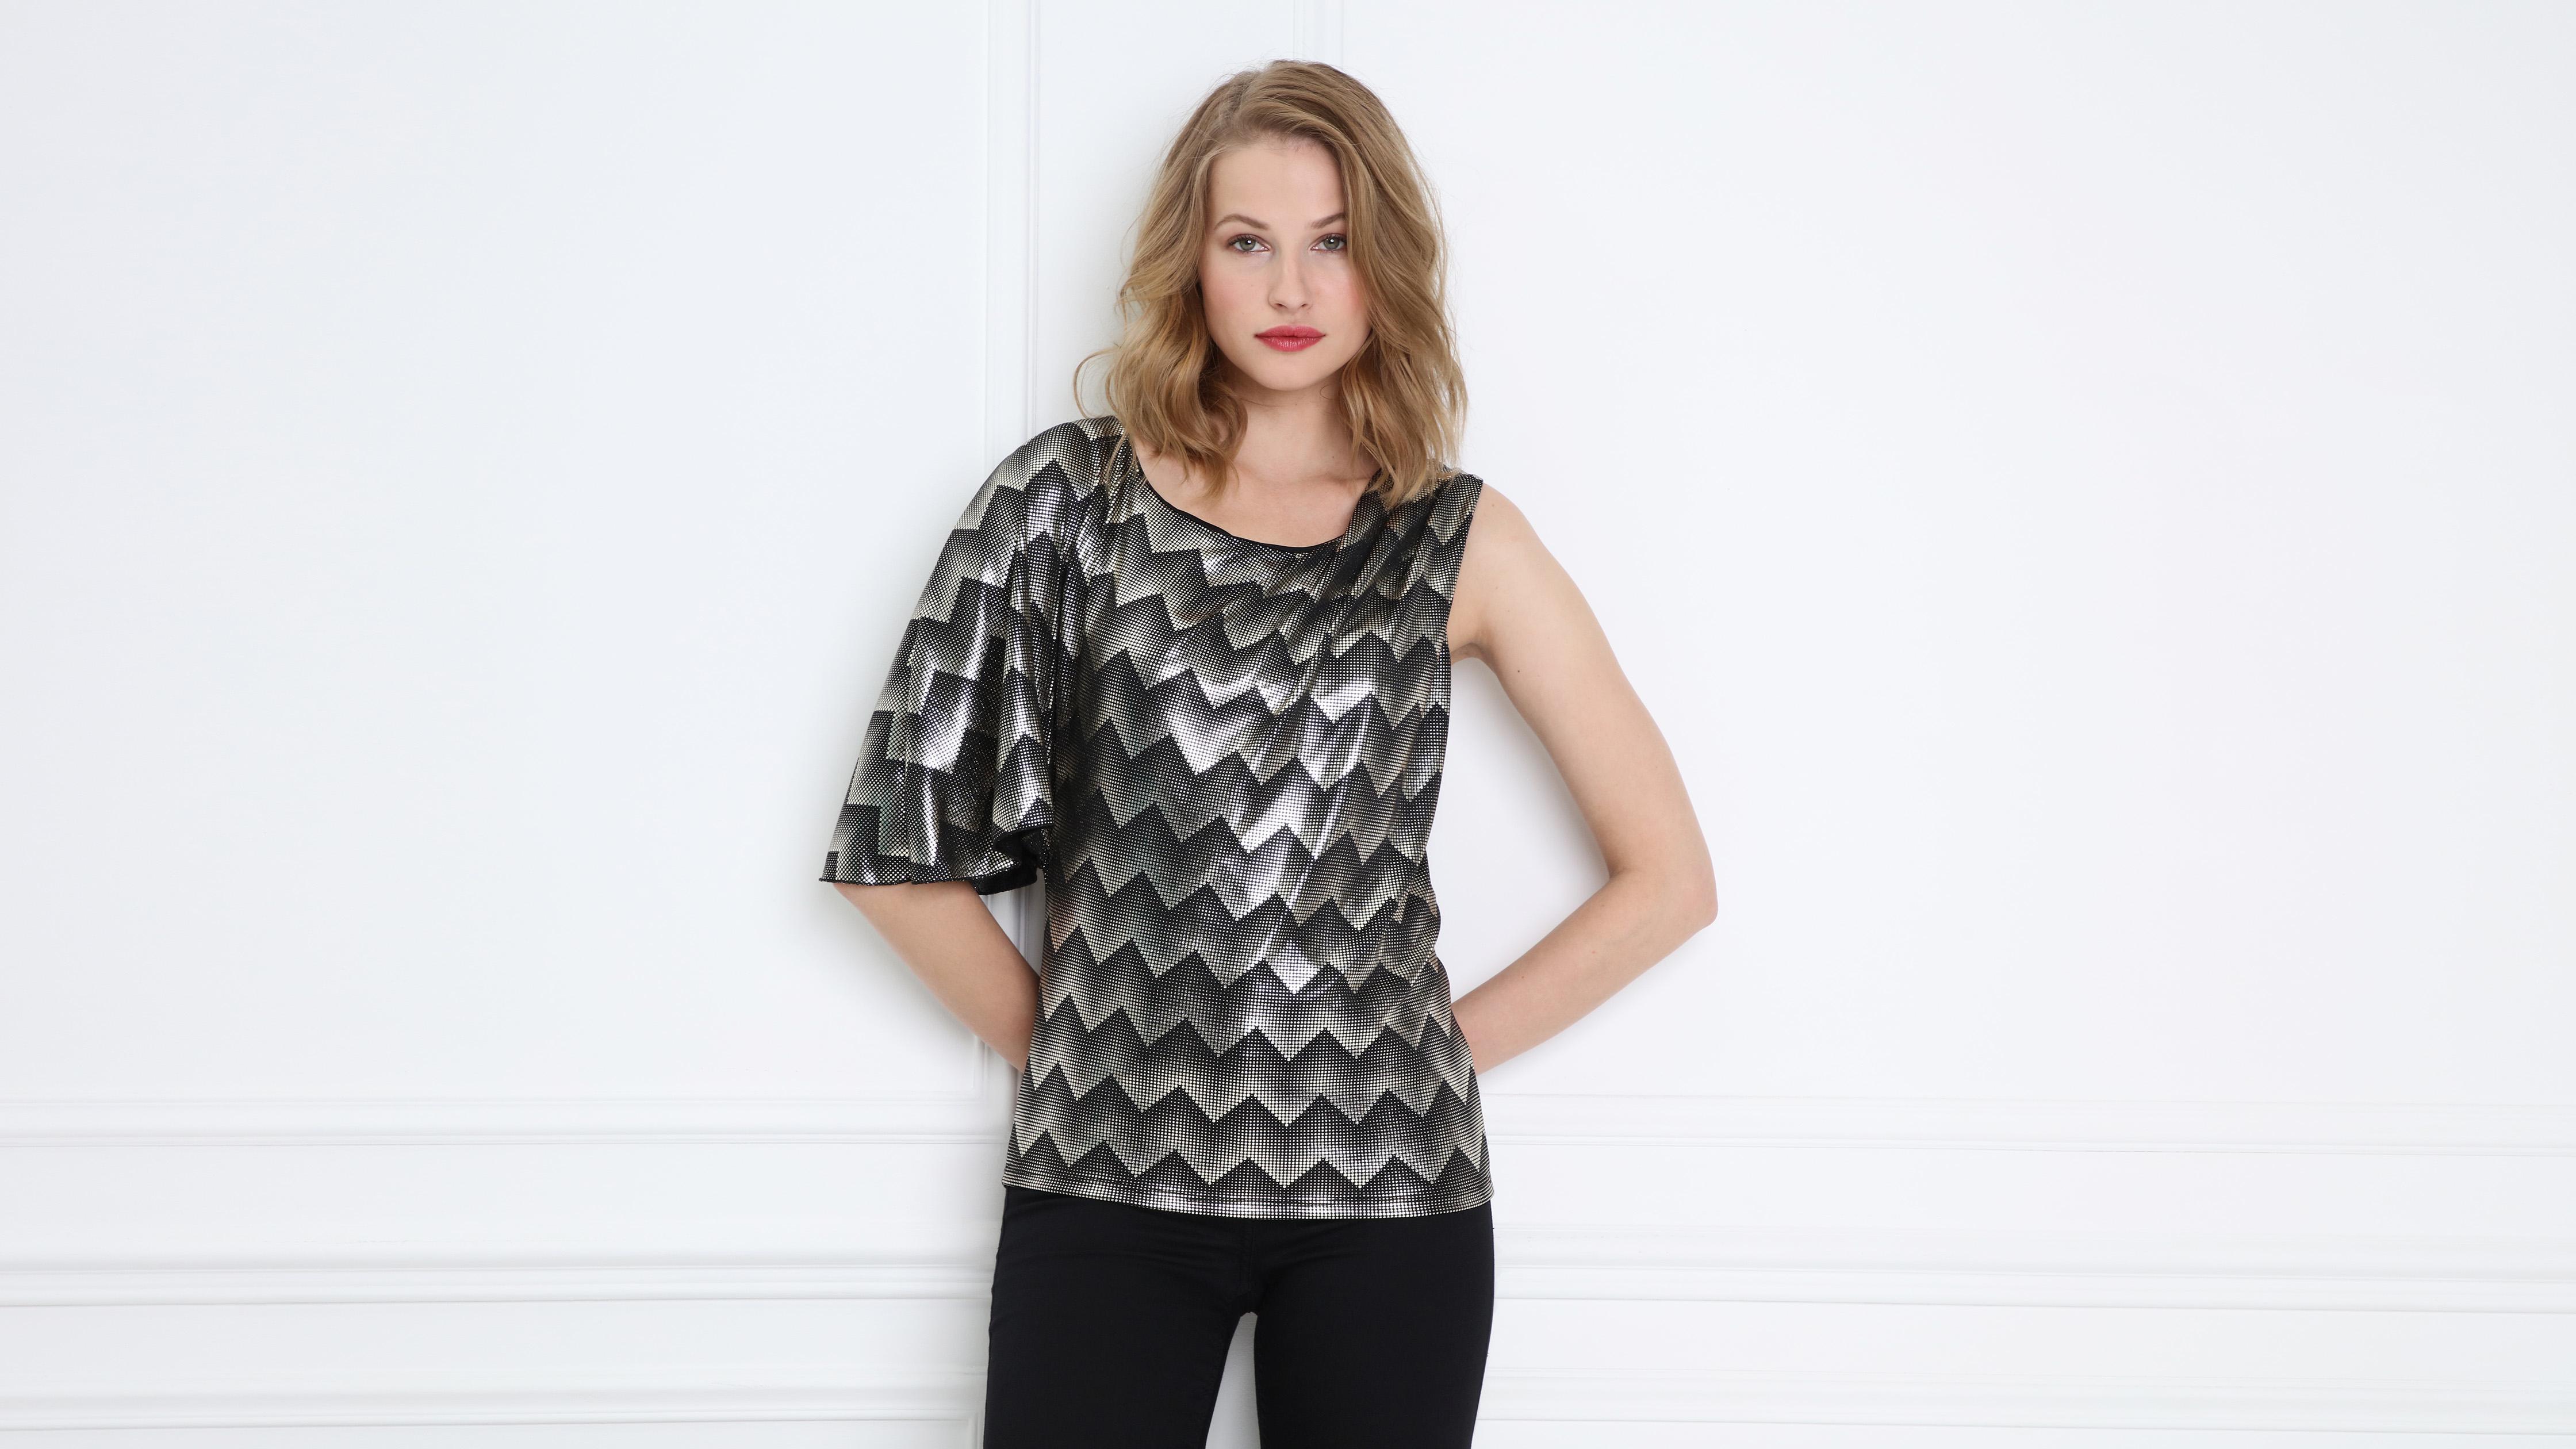 T Femme Asymétriques Manches Shirt Noir Yb7yfI6gv